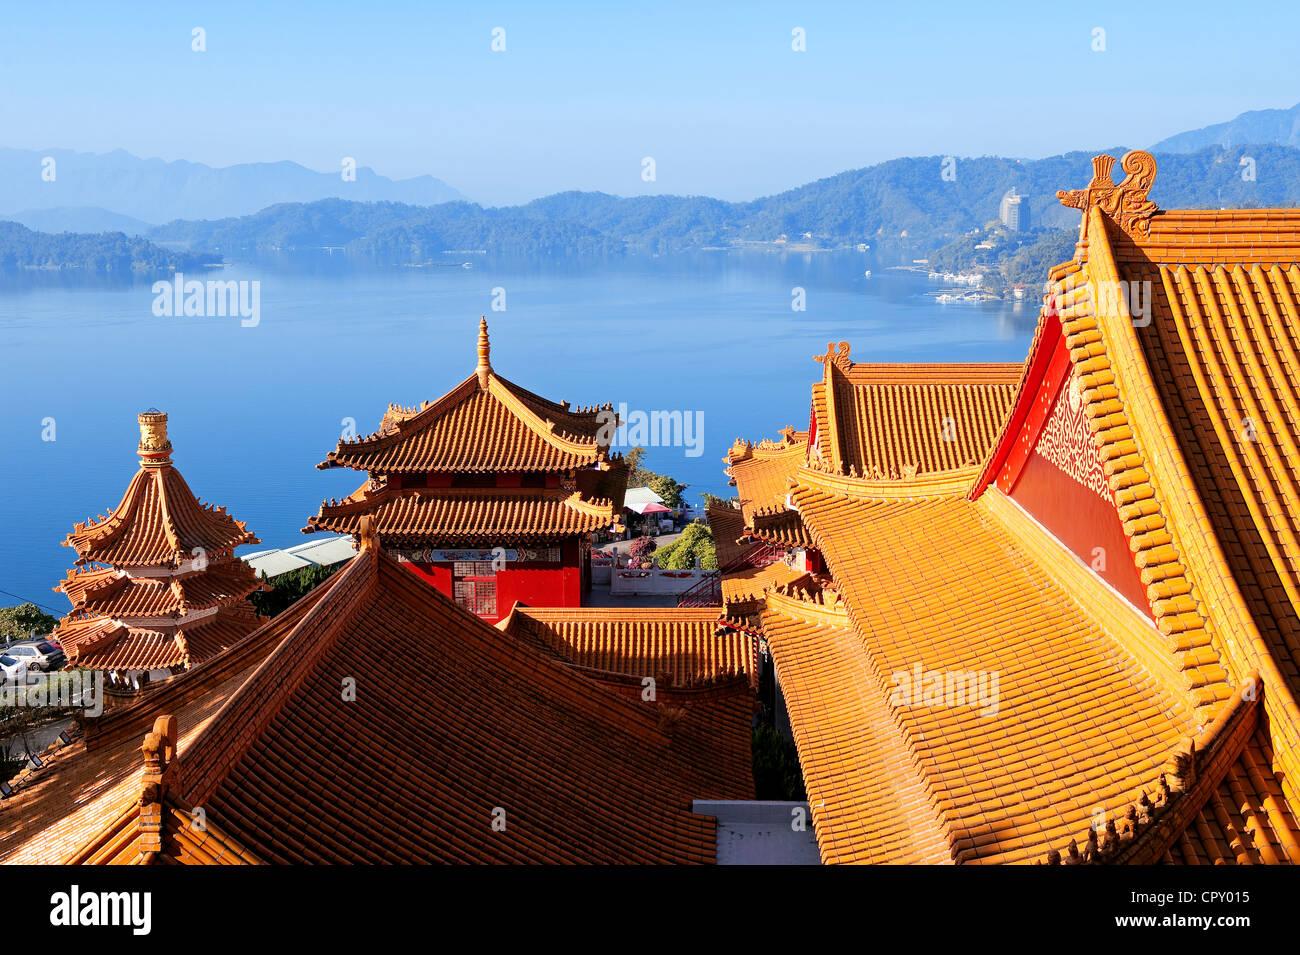 Taiwan, District de Nantou, Sun Moon Lake Region, Confucius Temple (Temple Wenwu) Photo Stock